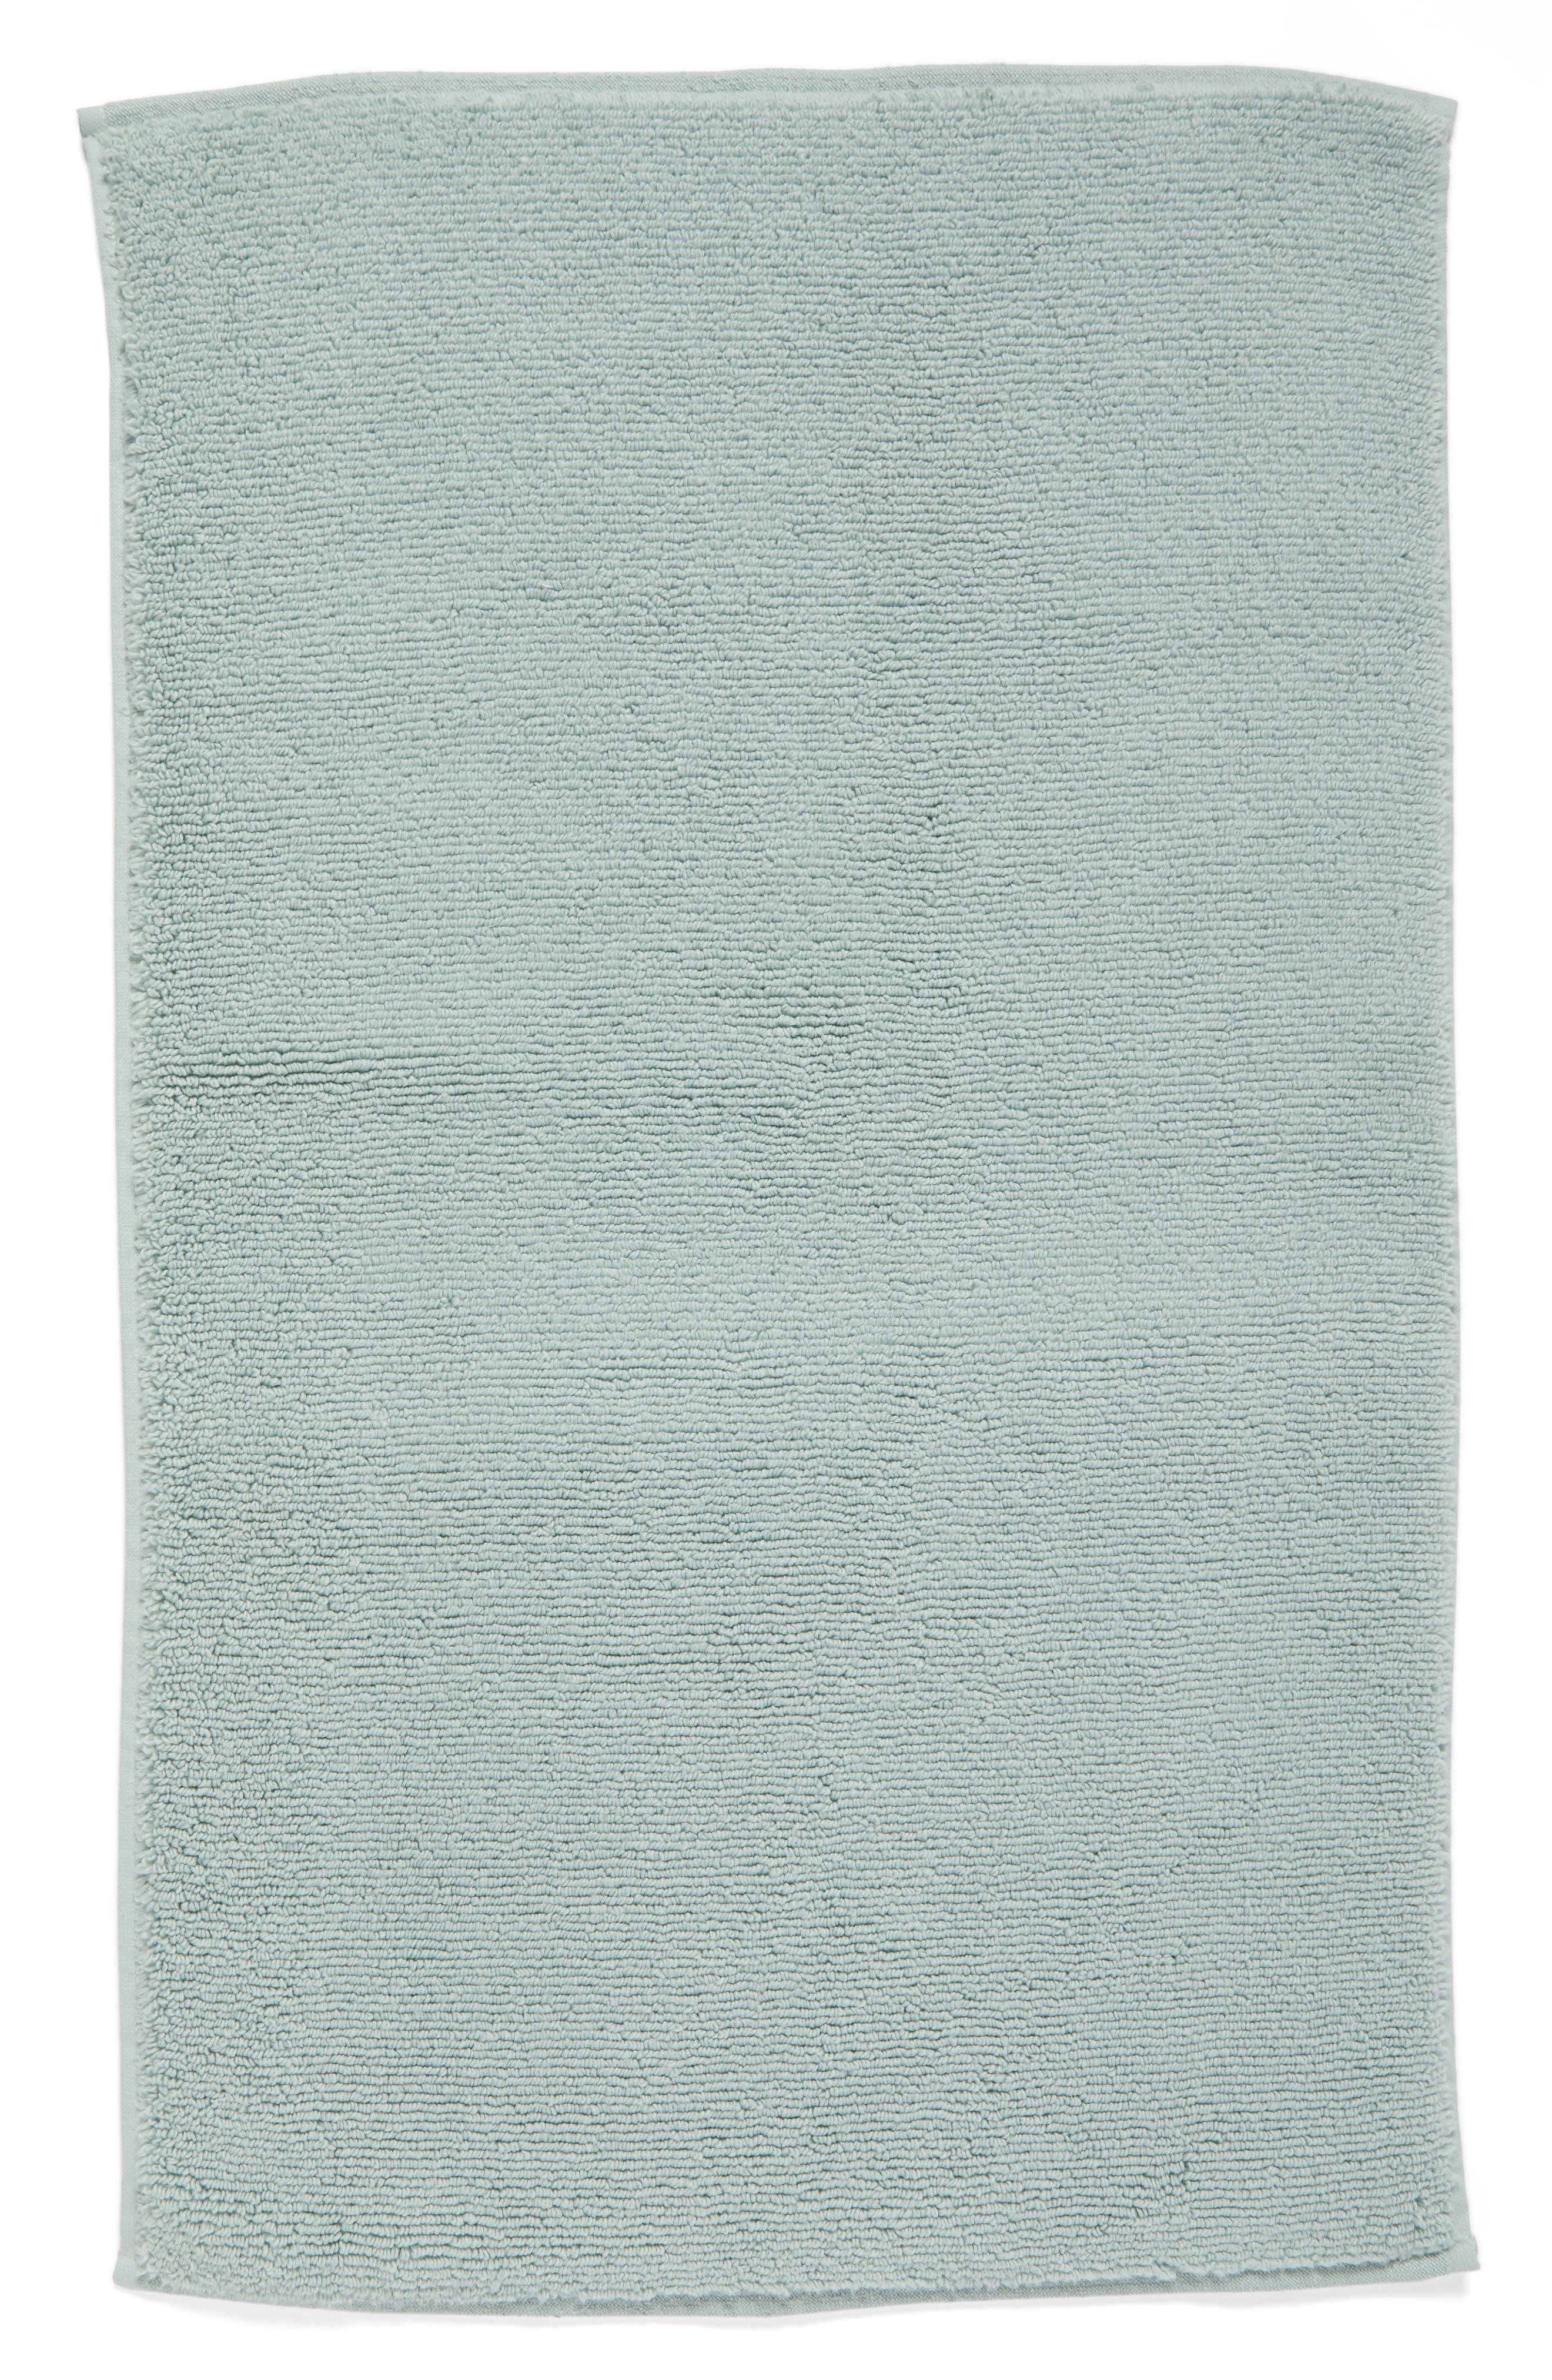 Hydrocotton Bath Mat,                         Main,                         color, Teal Mist